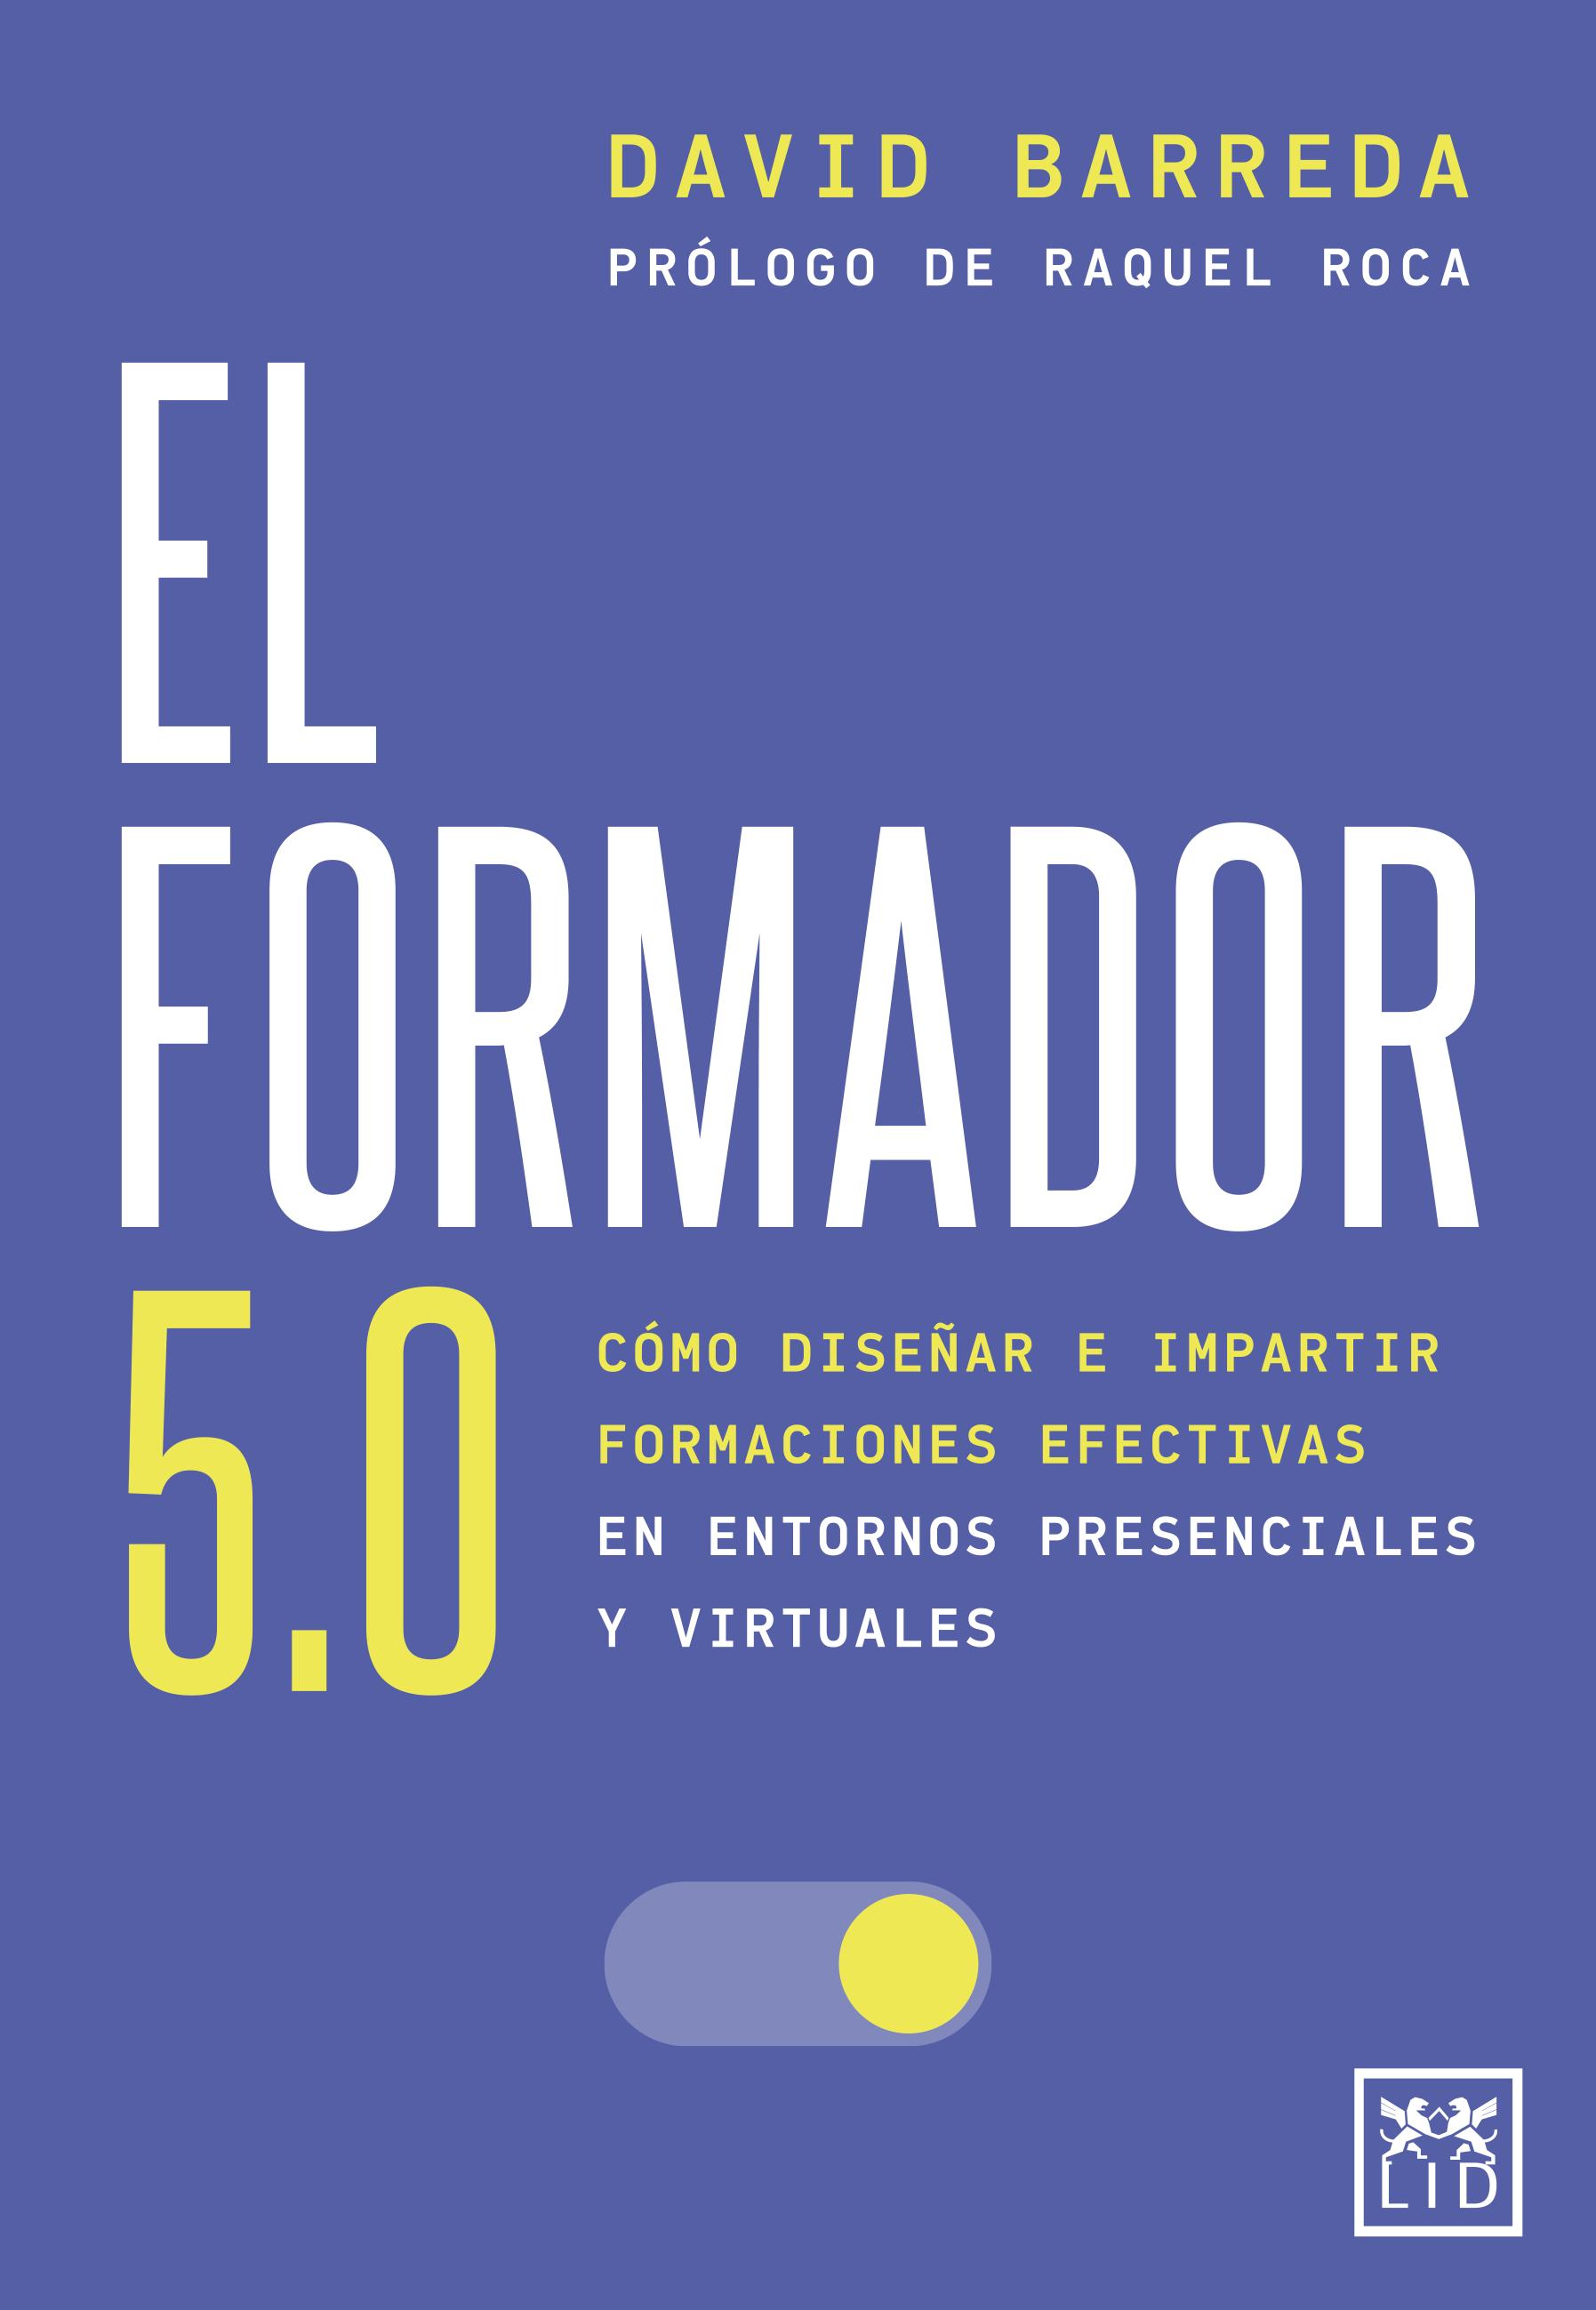 El Formador 5.0 - David Barreda